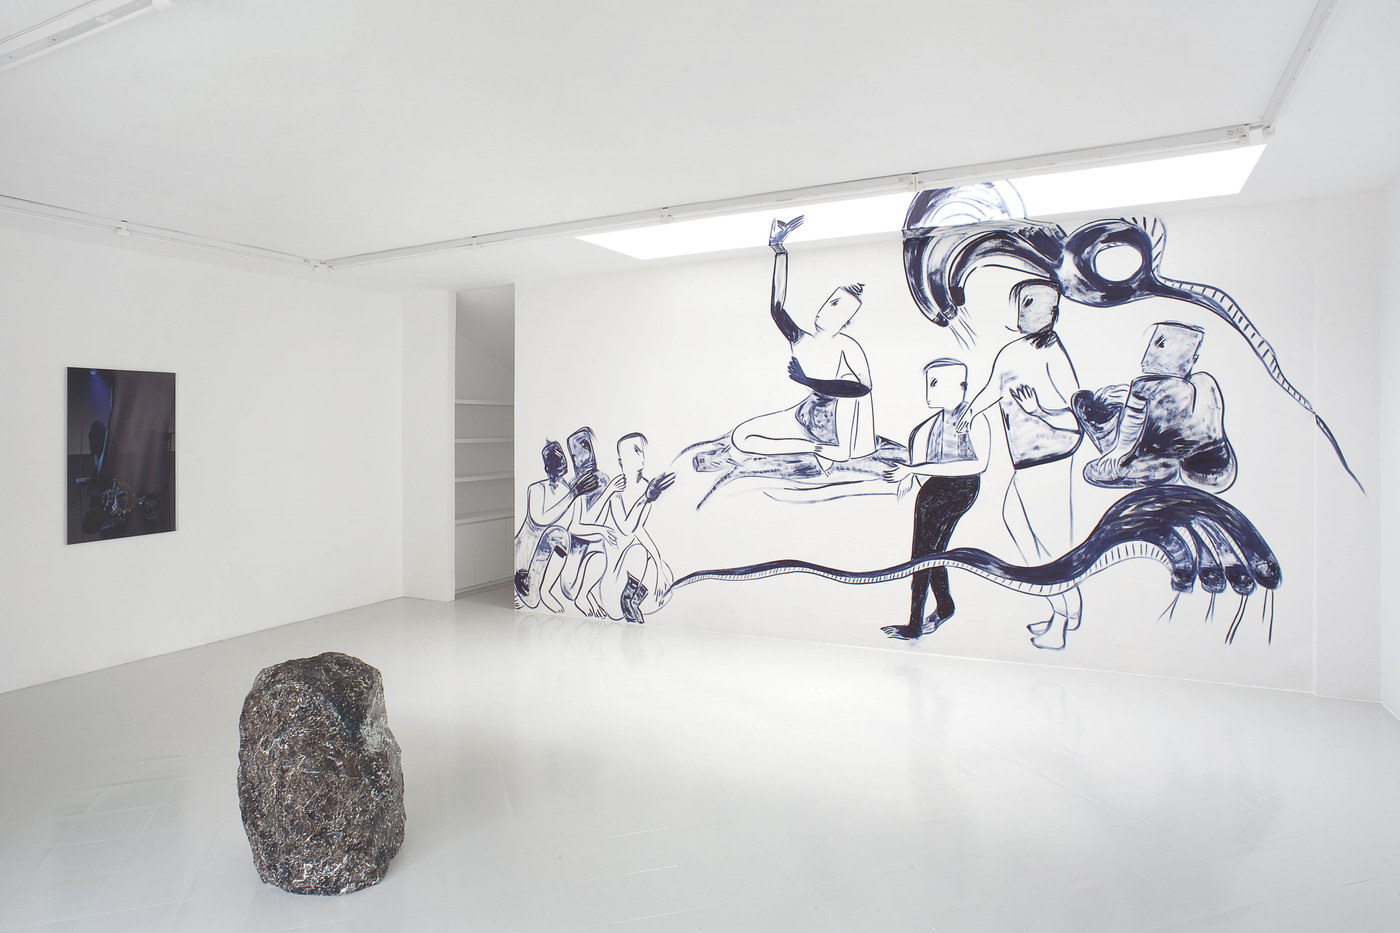 11 - Melike Kara, Lindsay Lawson, Installation View, 2016 - Courtesy Studiolo, Milan